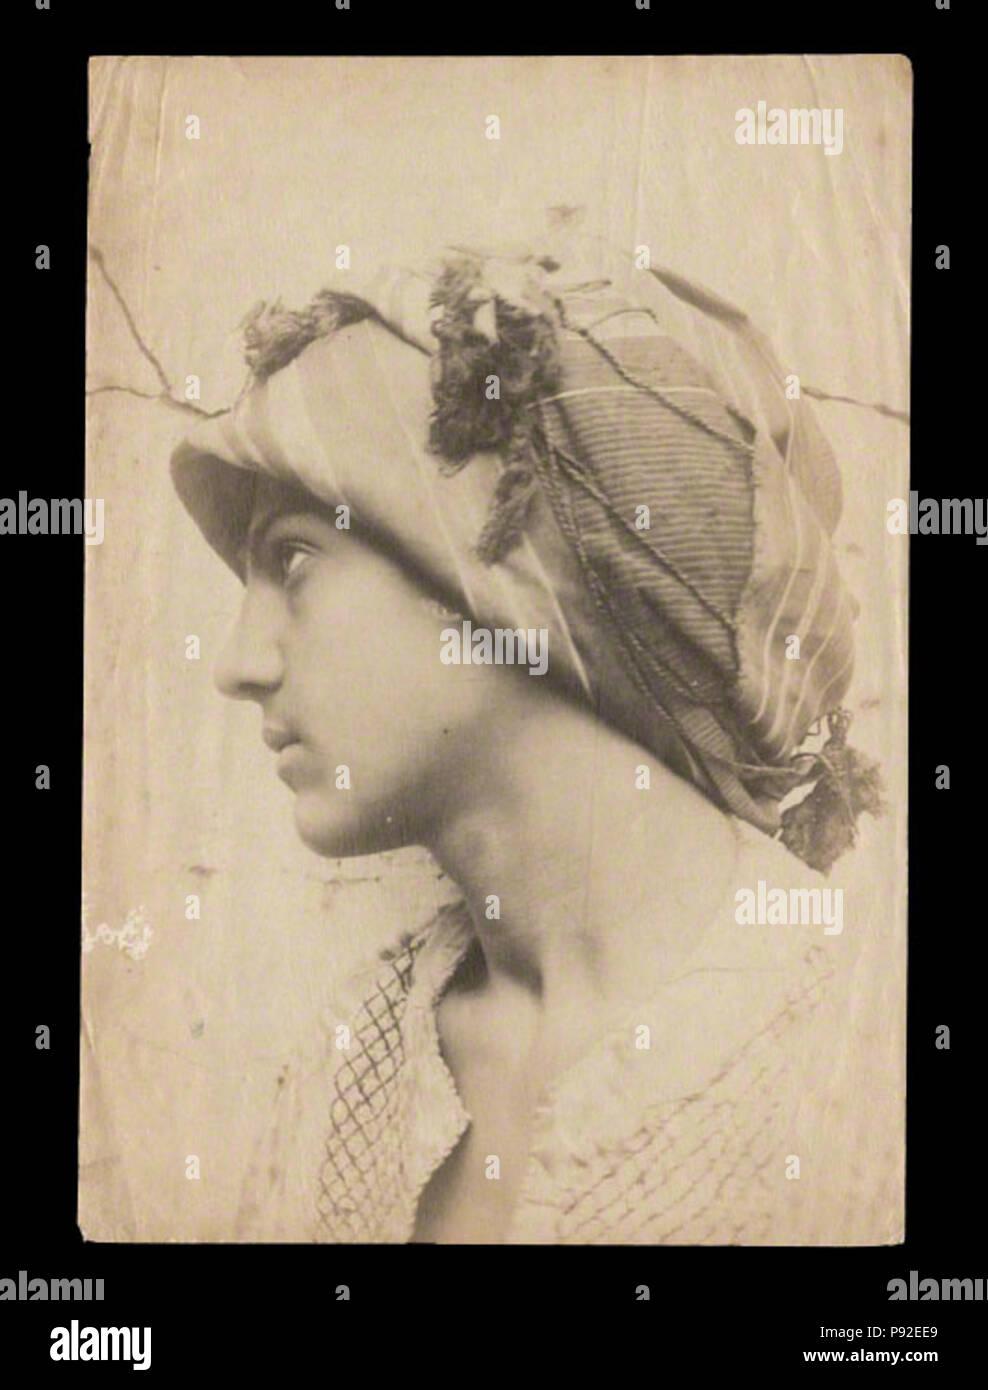 465 Pluschow, Wilhelm von (1852-1930) - n. 1298 - Galdi col turbante - da - p arcadiennes Immagini Stock